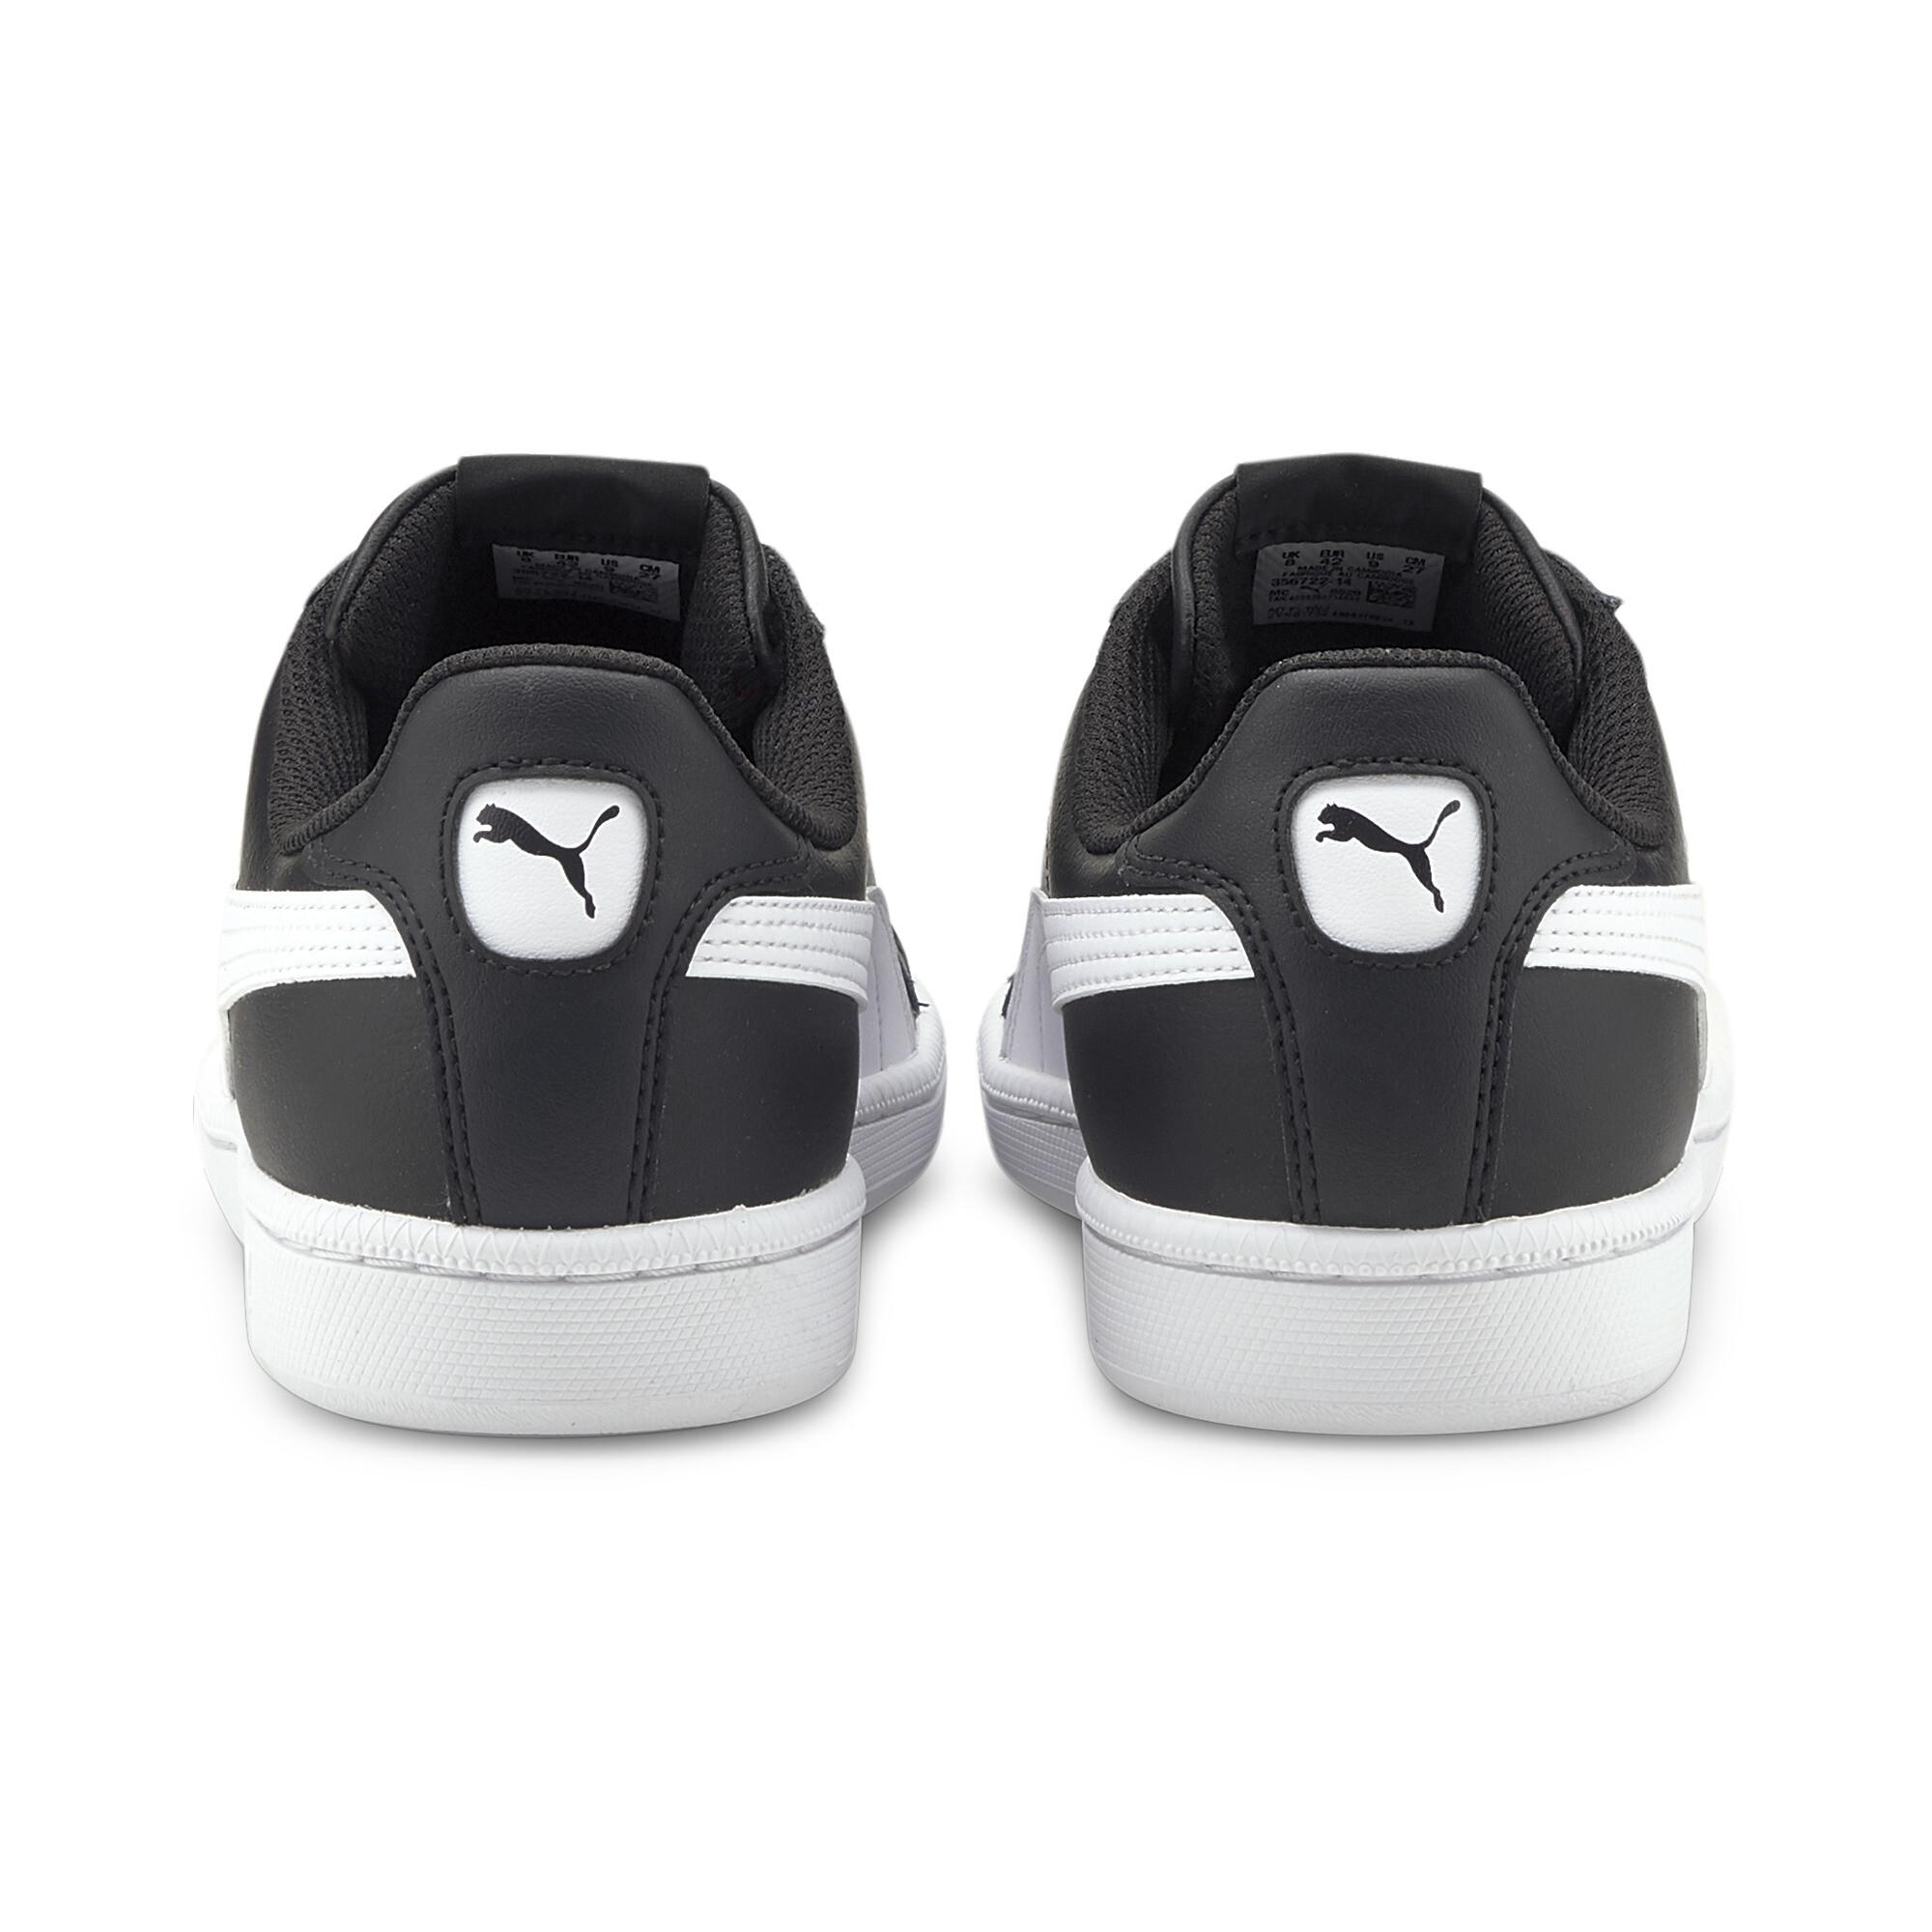 PUMA-Smash-Trainers-Schuhe-Sneakers-Sport-Classics-Unisex-Neu Indexbild 23